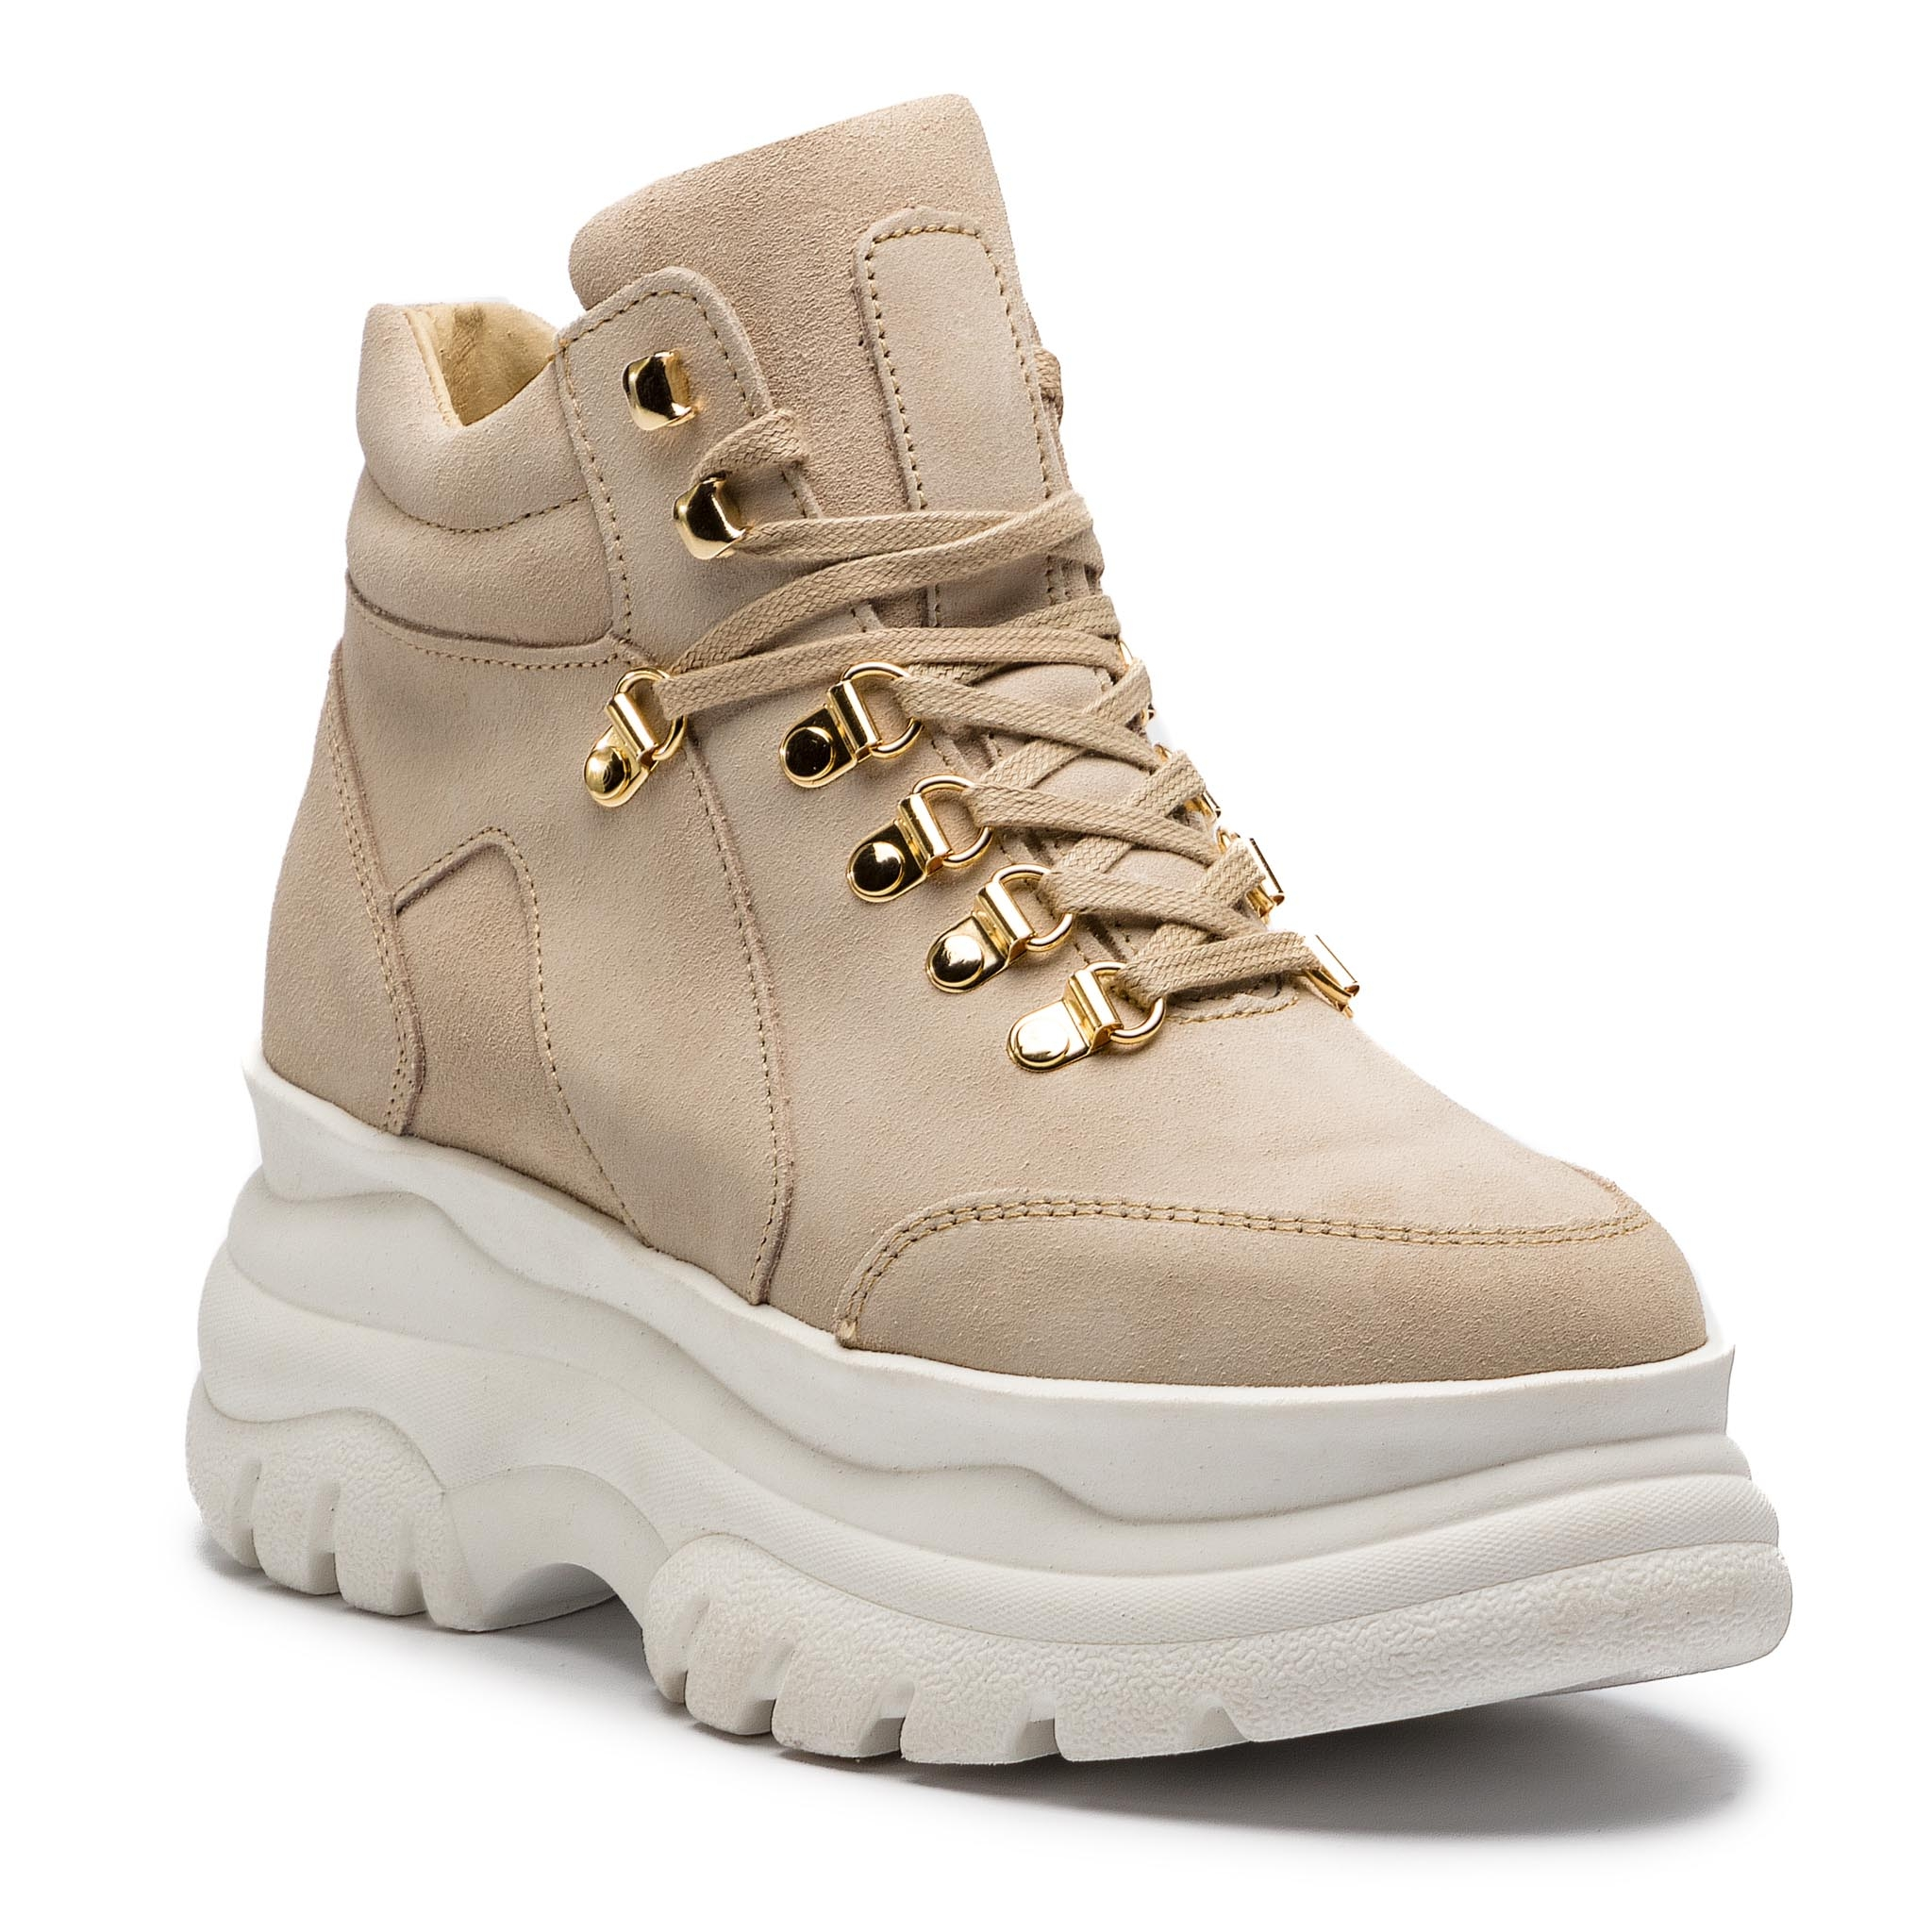 Sneakersy EVA MINGE - Asegur 18PM1372669EF 203 - Glami.sk 8befc5d925a